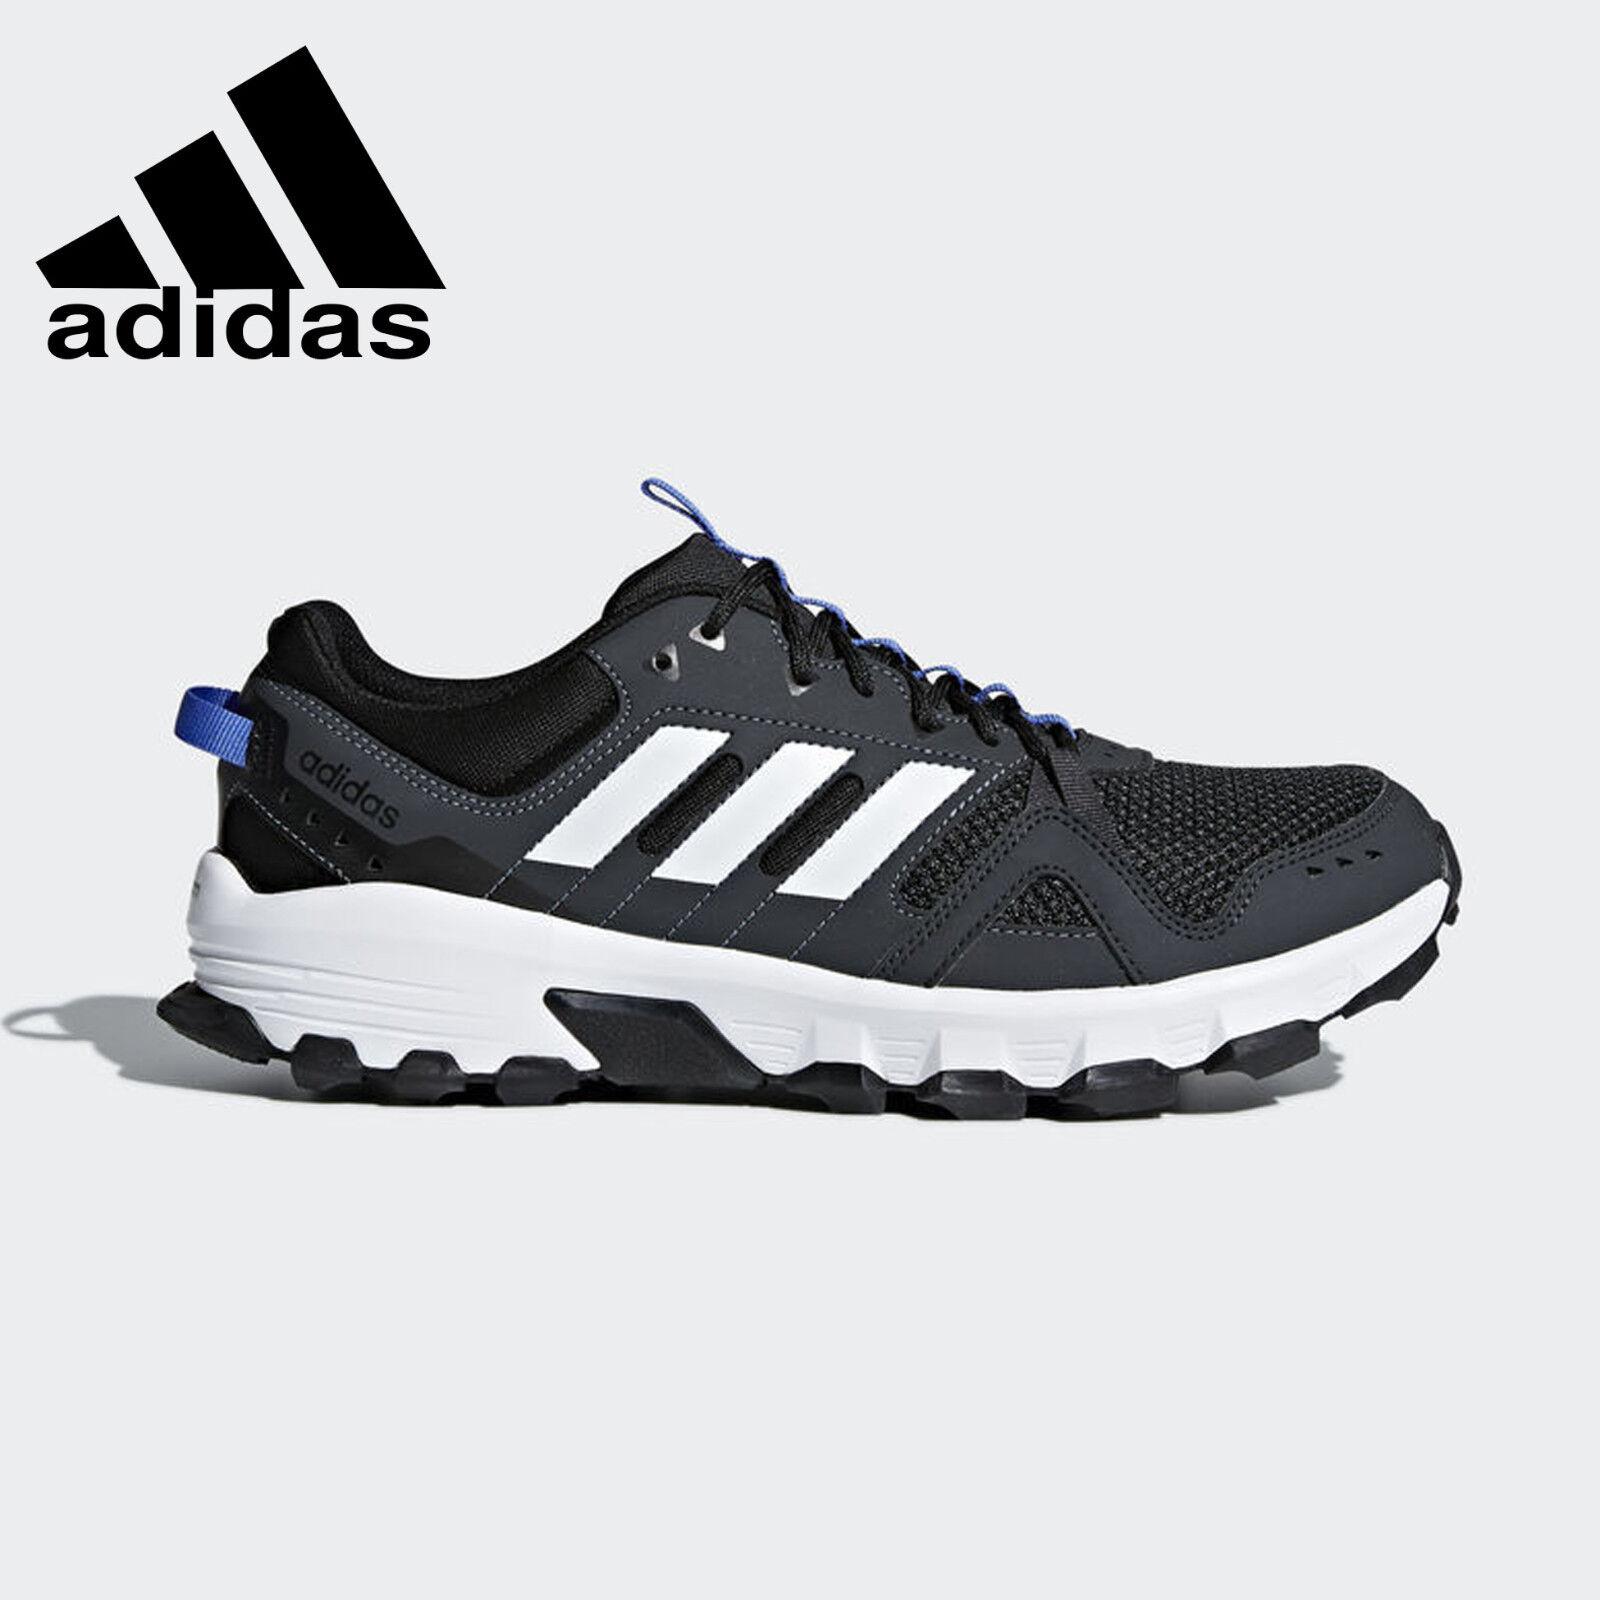 Adidas Rockadia Trail Black   White Trail Running shoes Mens Size 10 (CM7212)